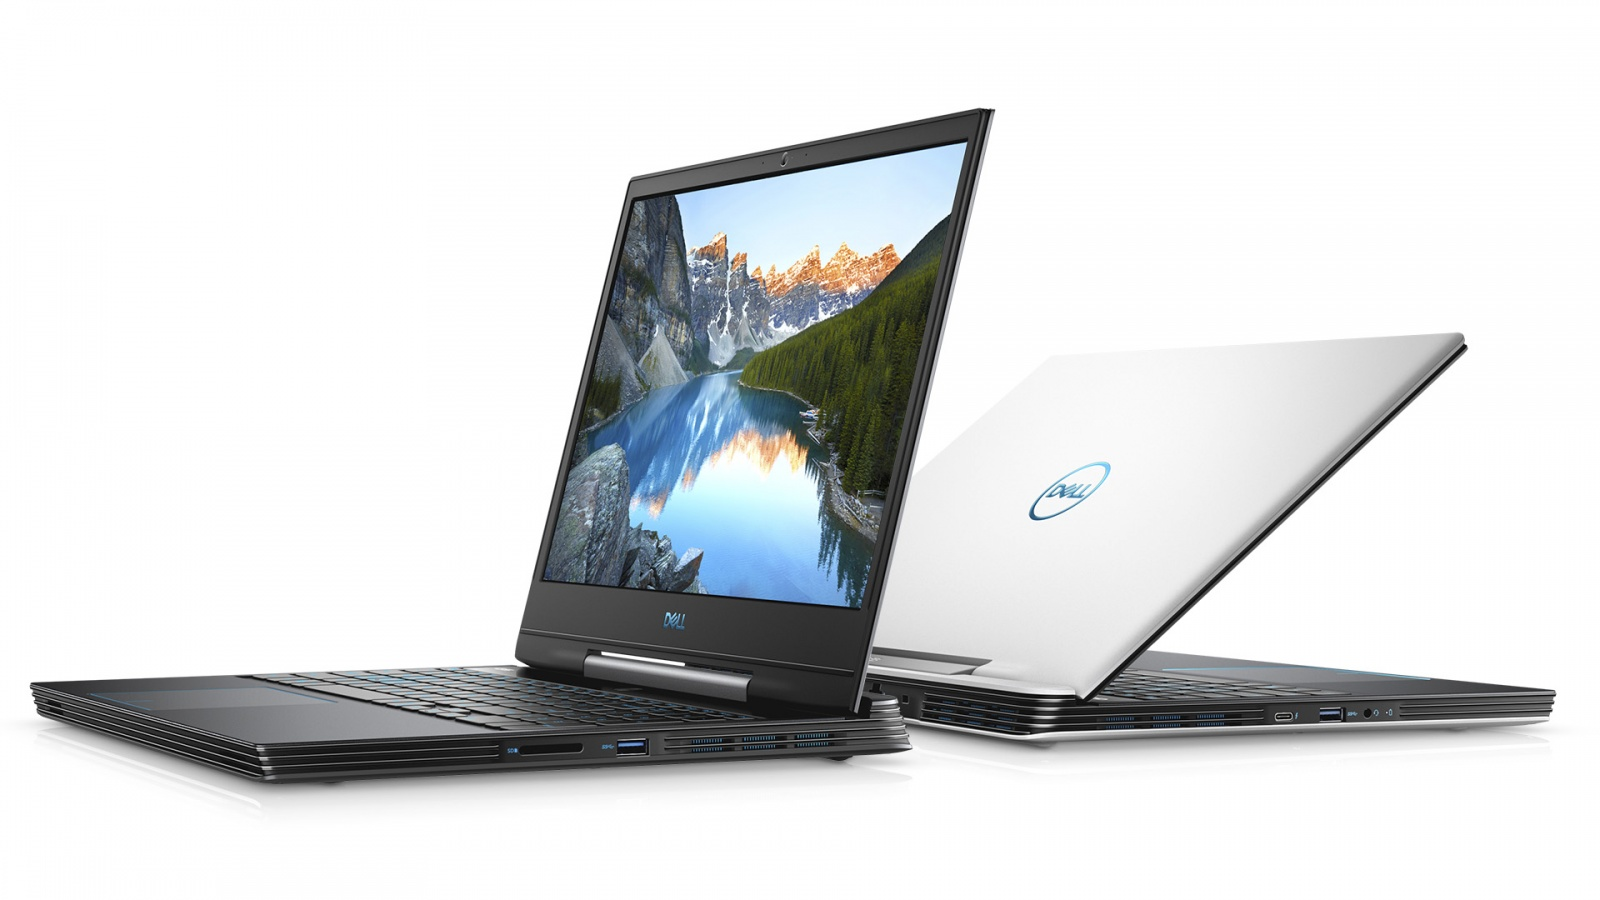 Dell и Alienware на CES 2019: гайд по всем основным новинкам - 20